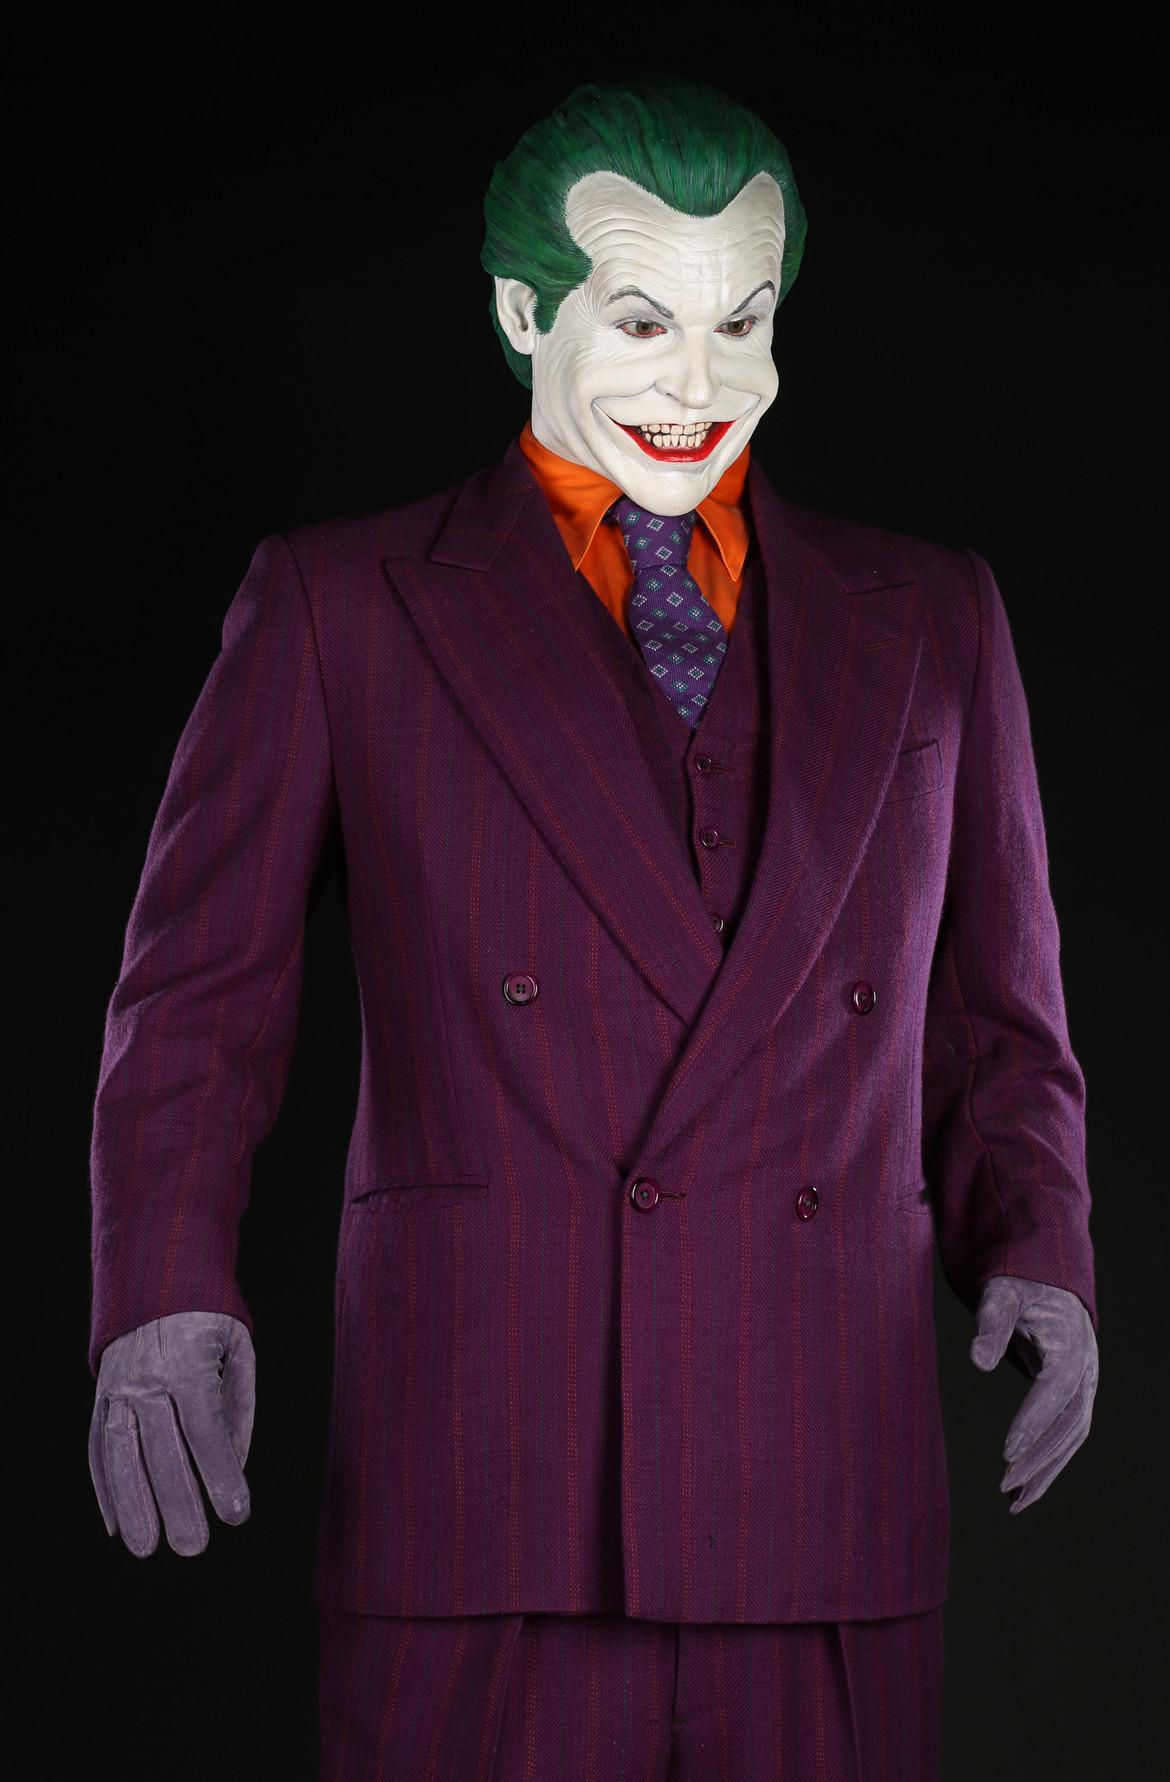 72682_The Joker's (Jack Nicholson) Costume (2).JPG